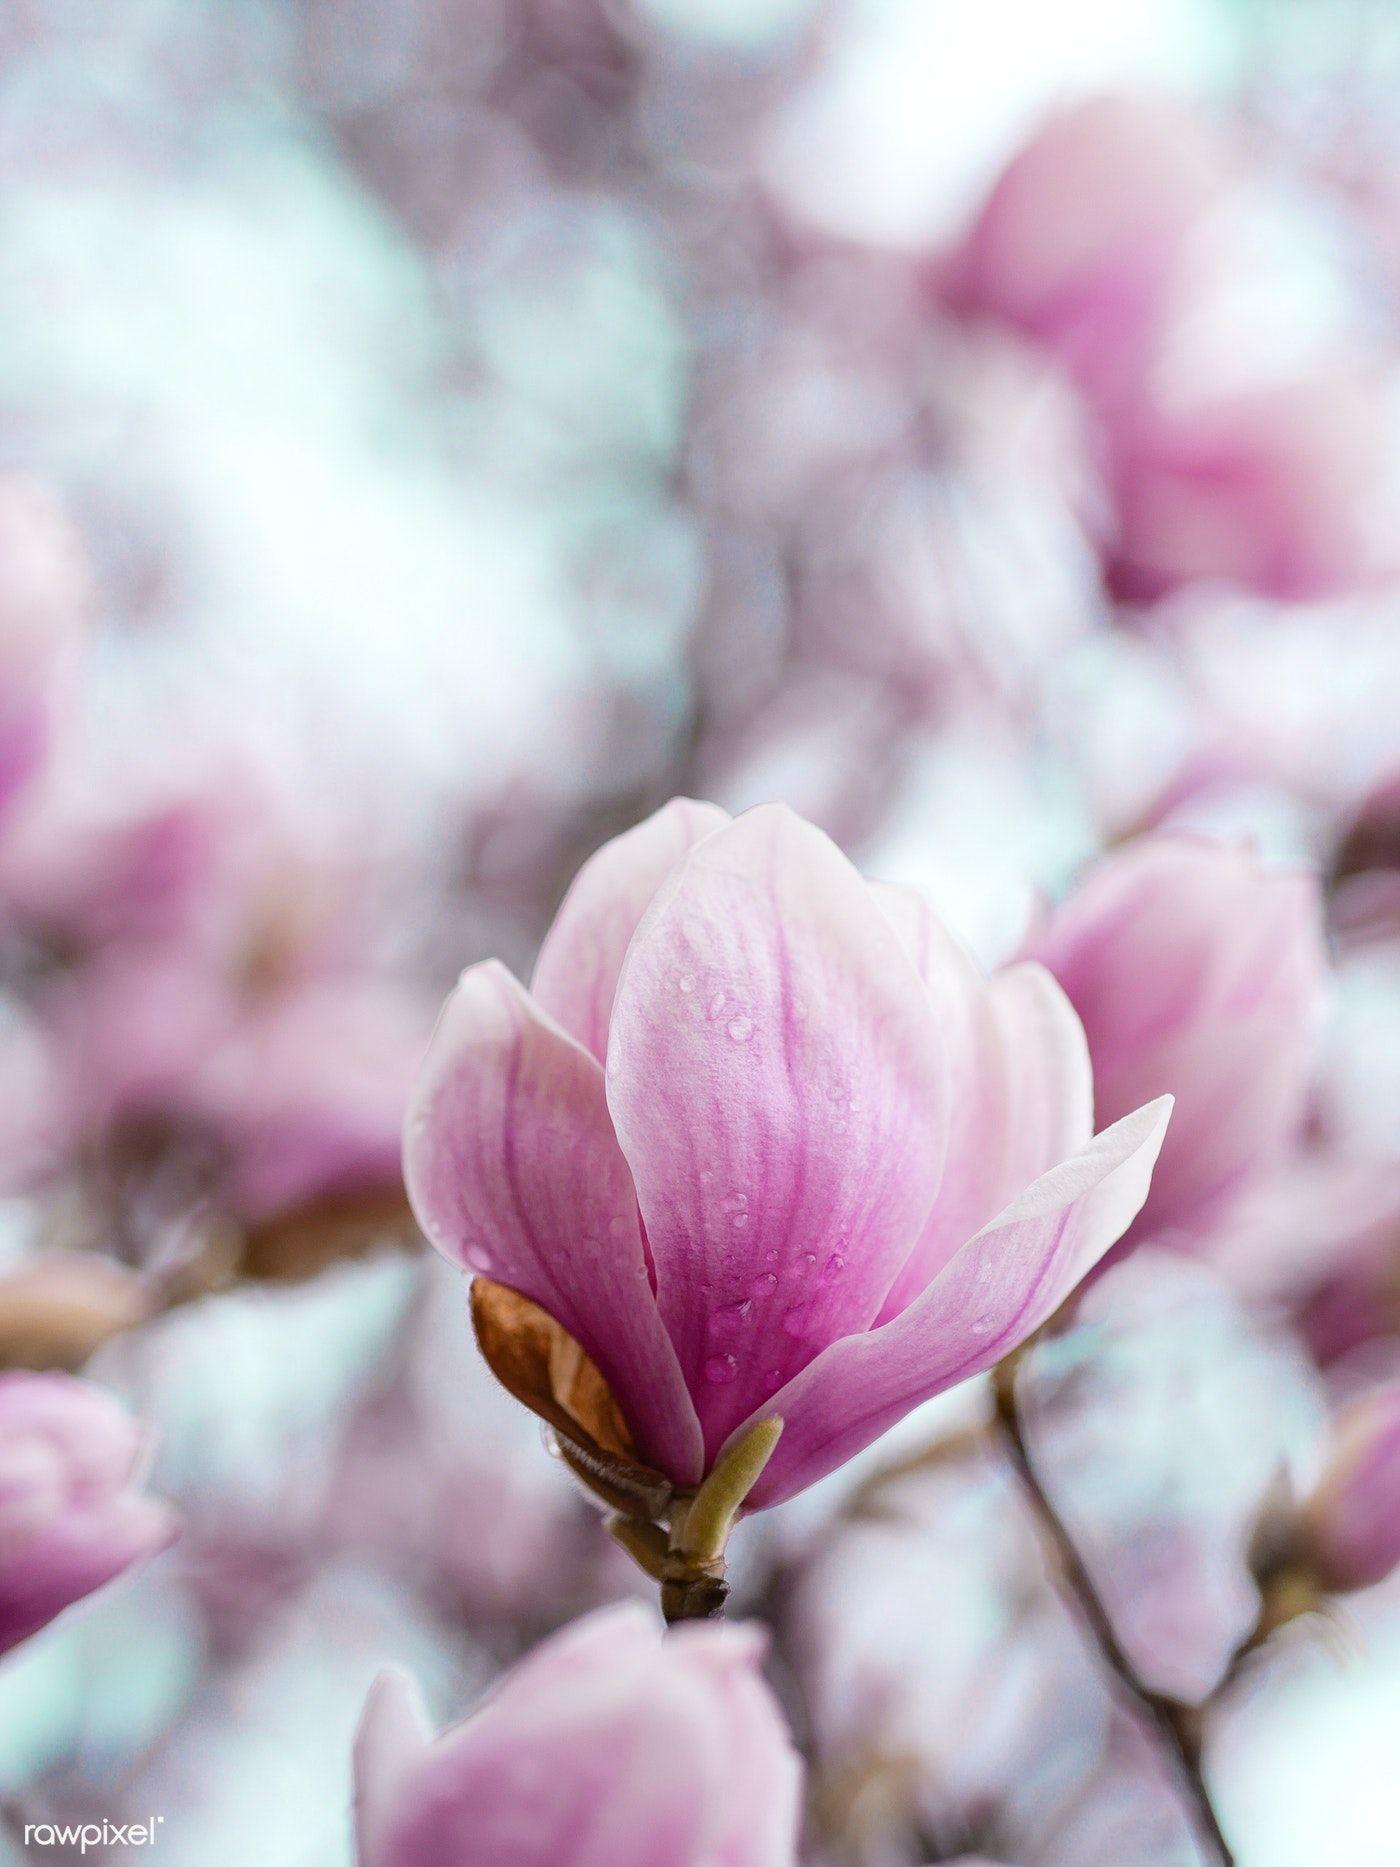 Closeup Of Pink Magnolia Flowers Free Image By Rawpixel Com Aaron Burden Magnolia Flower Flowers Macro Photography Flowers